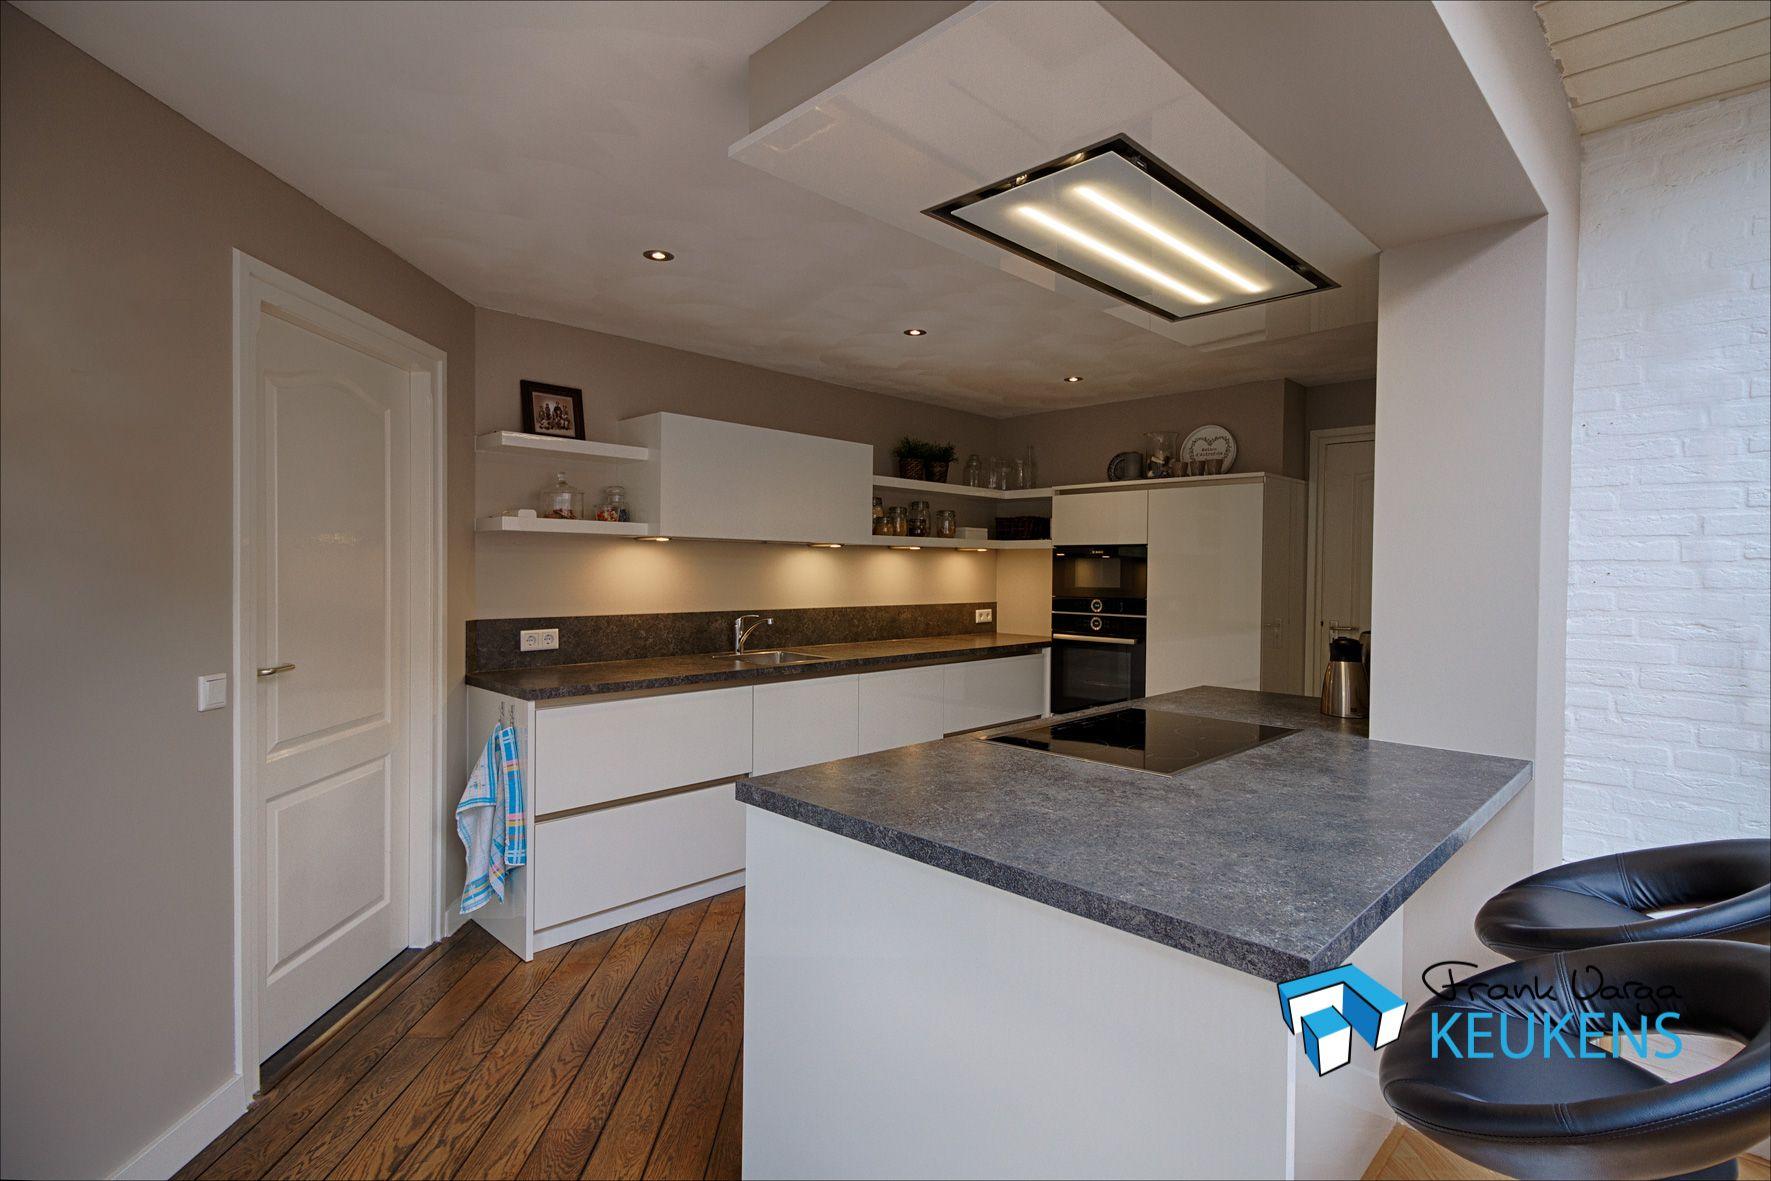 Kookeiland Wit Hoogglans : Strakke witte hoogglans keuken met kookeiland keukens in 2018